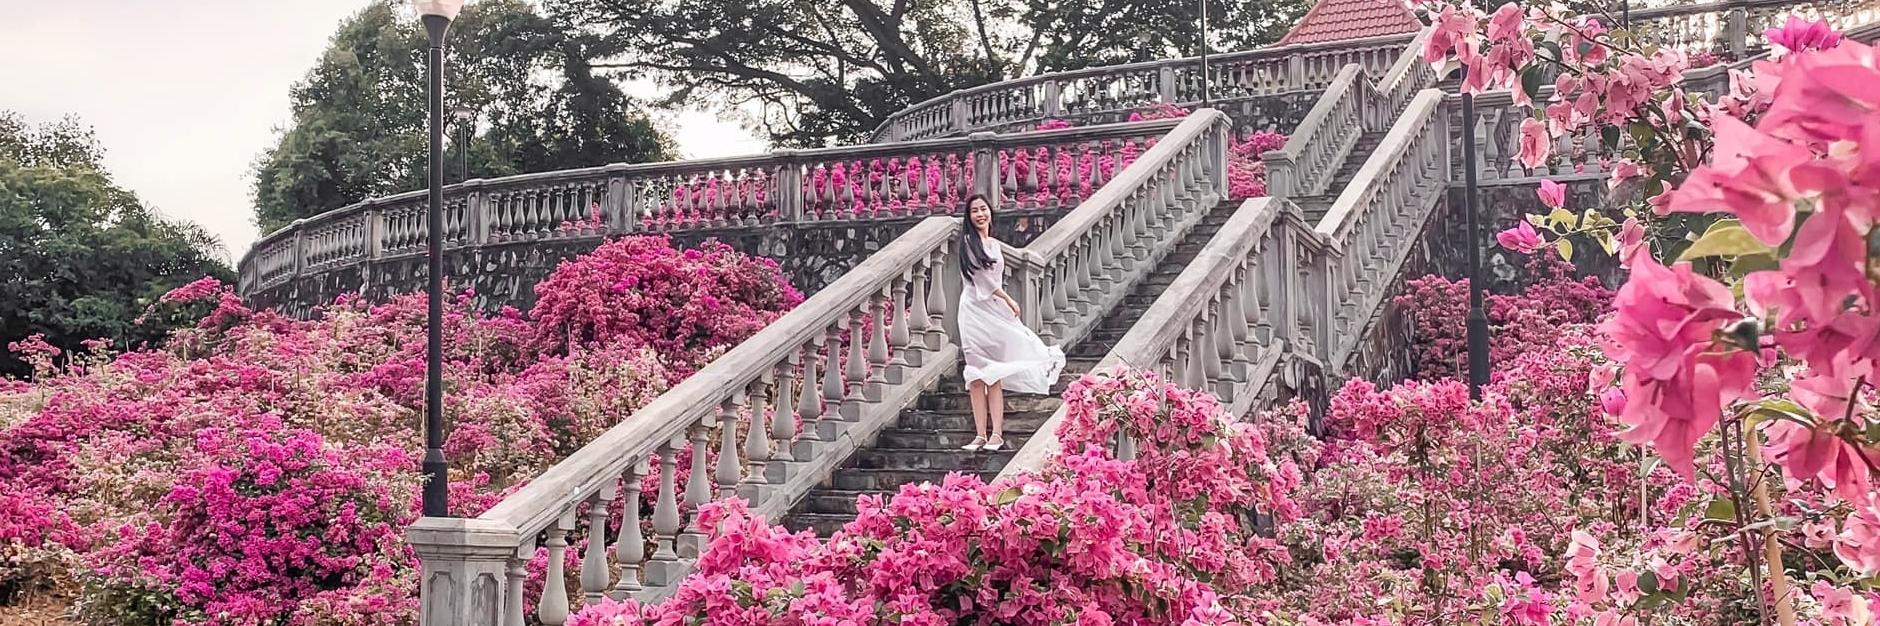 https://gody.vn/blog/anhchau8260/post/tha-ga-song-ao-voi-nhung-dia-diem-check-in-cuc-chat-va-moi-toanh-o-singapore-2019-5510